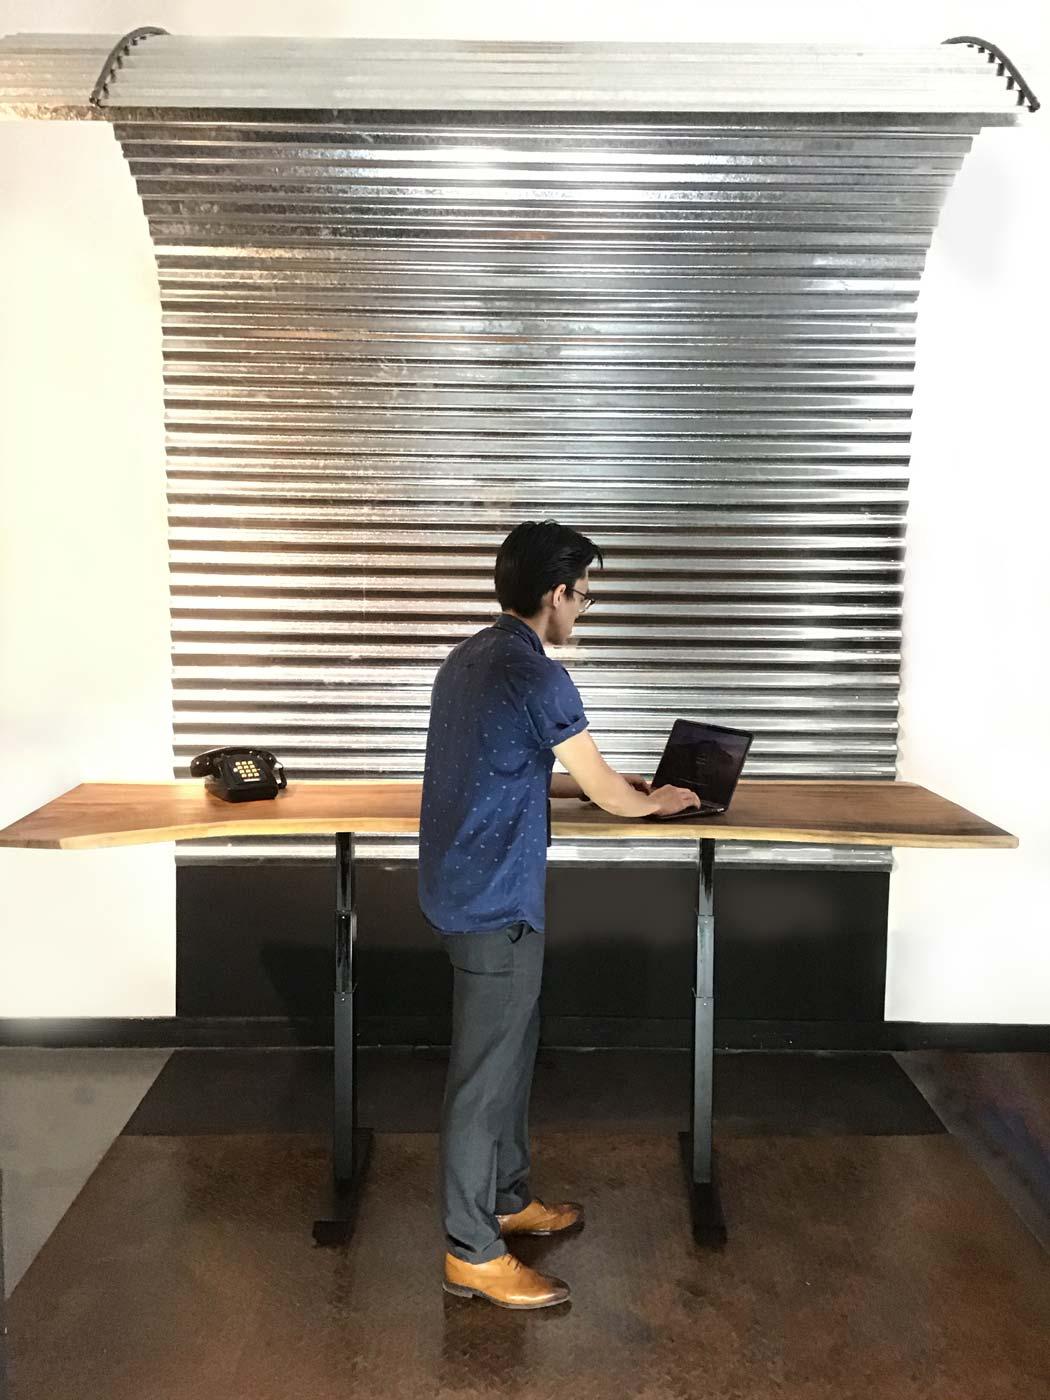 Live Edge Suarwood Table office set-up